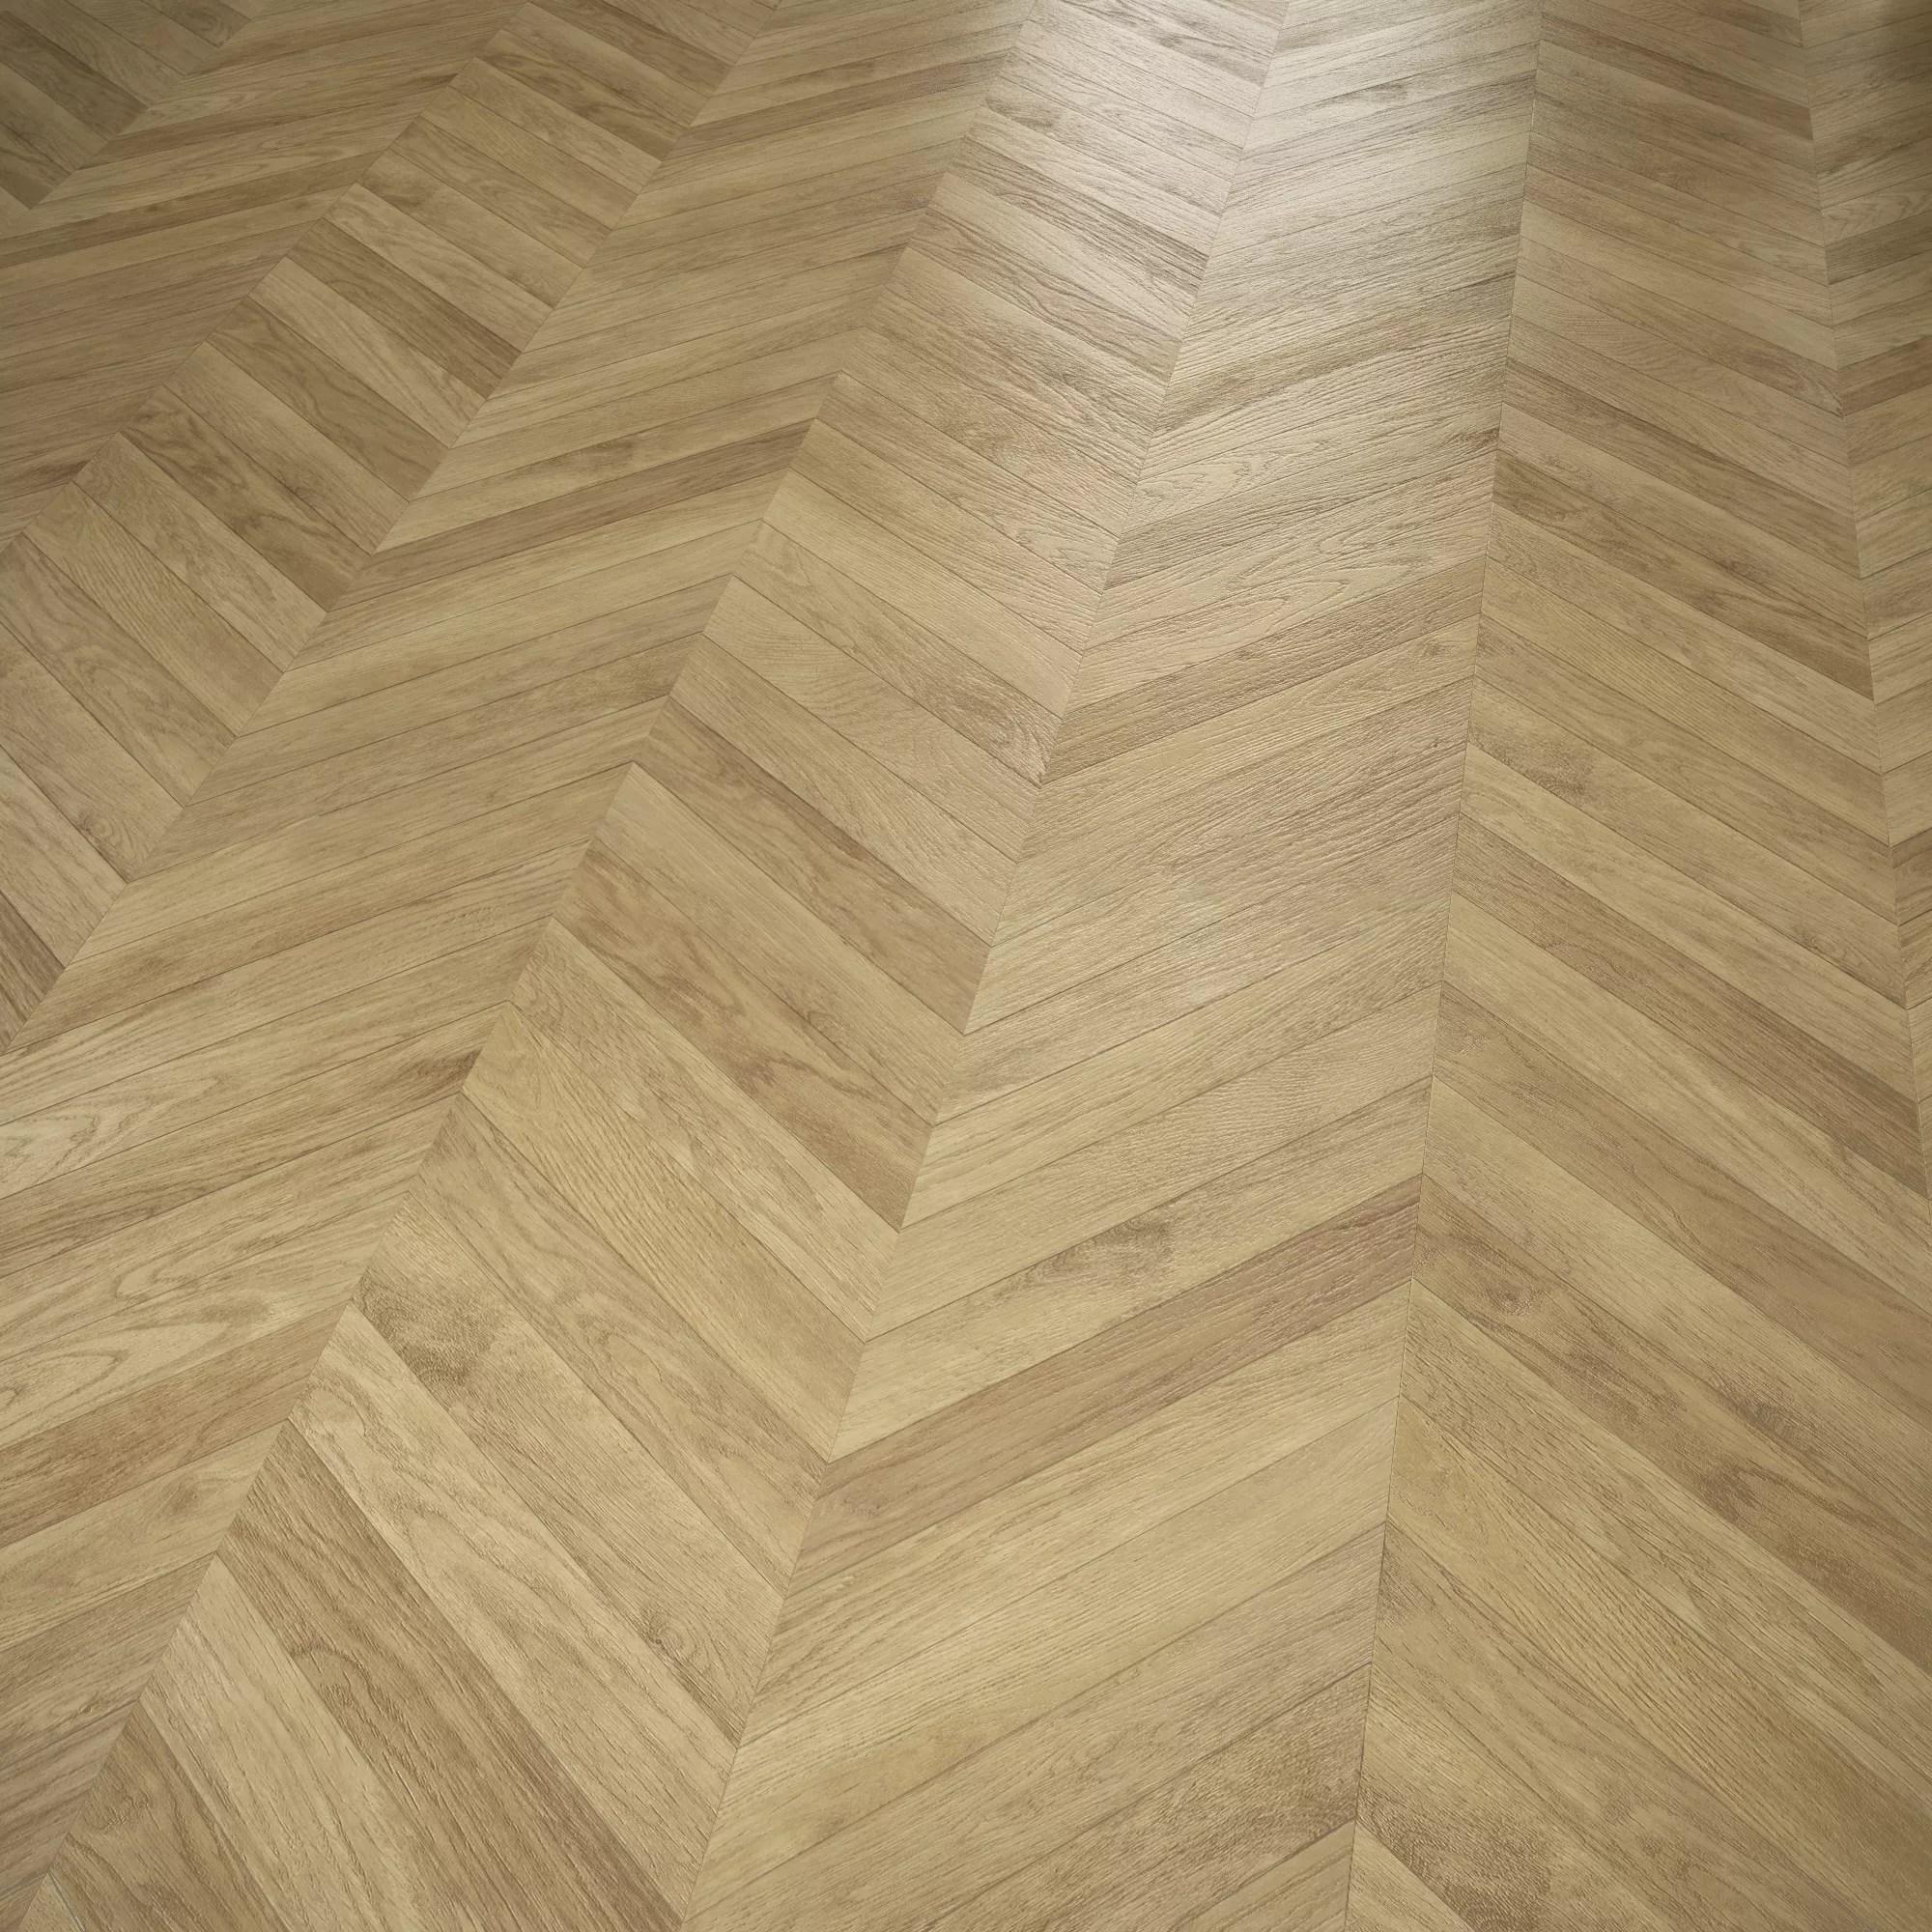 Alessano Natural Herringbone Oak Effect Laminate Flooring